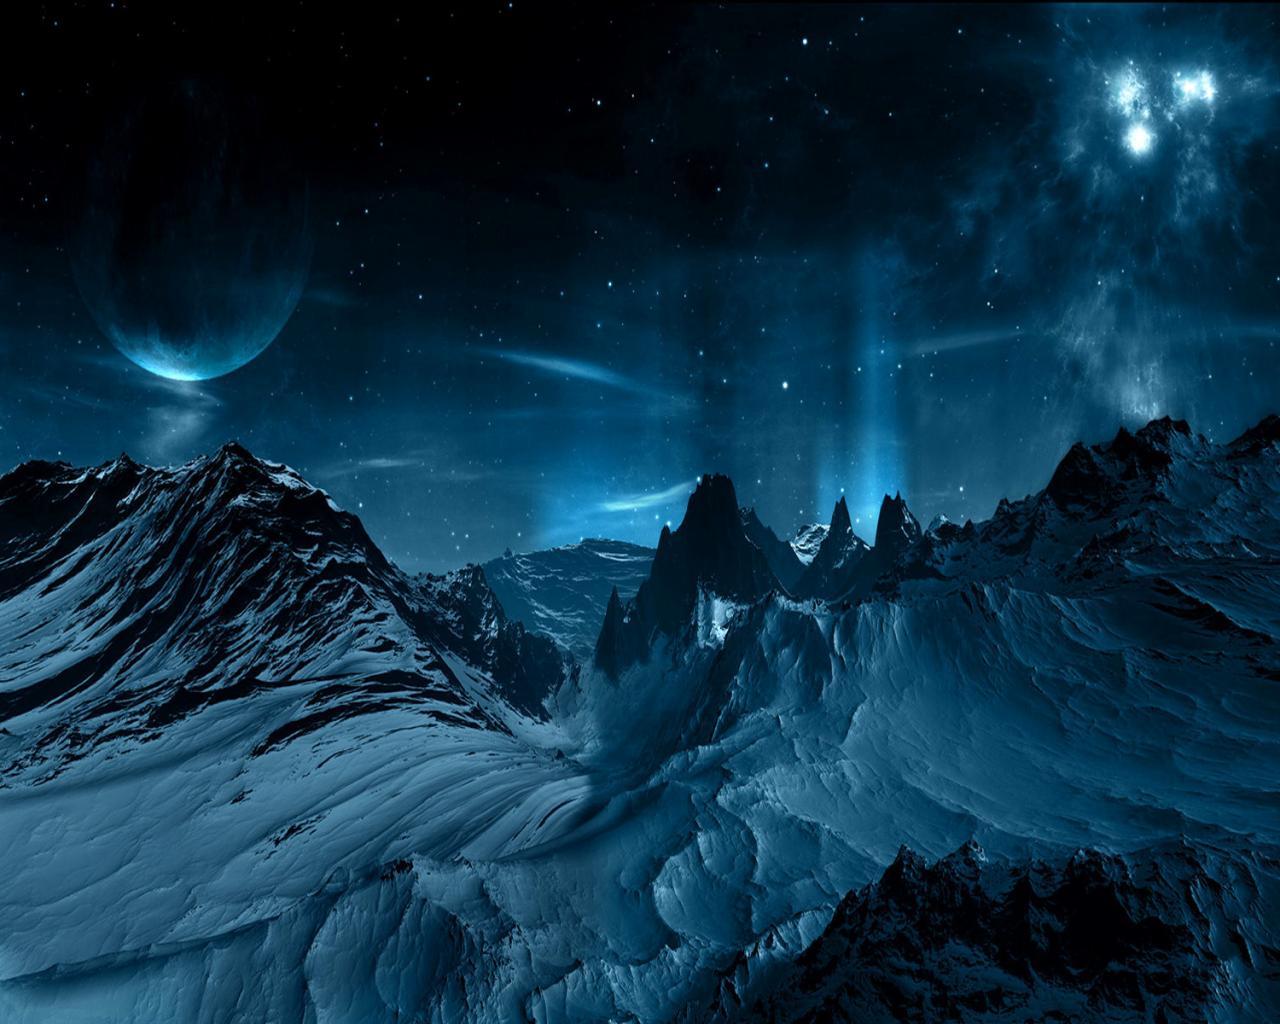 Космос космос горы планета снег 1280x1024